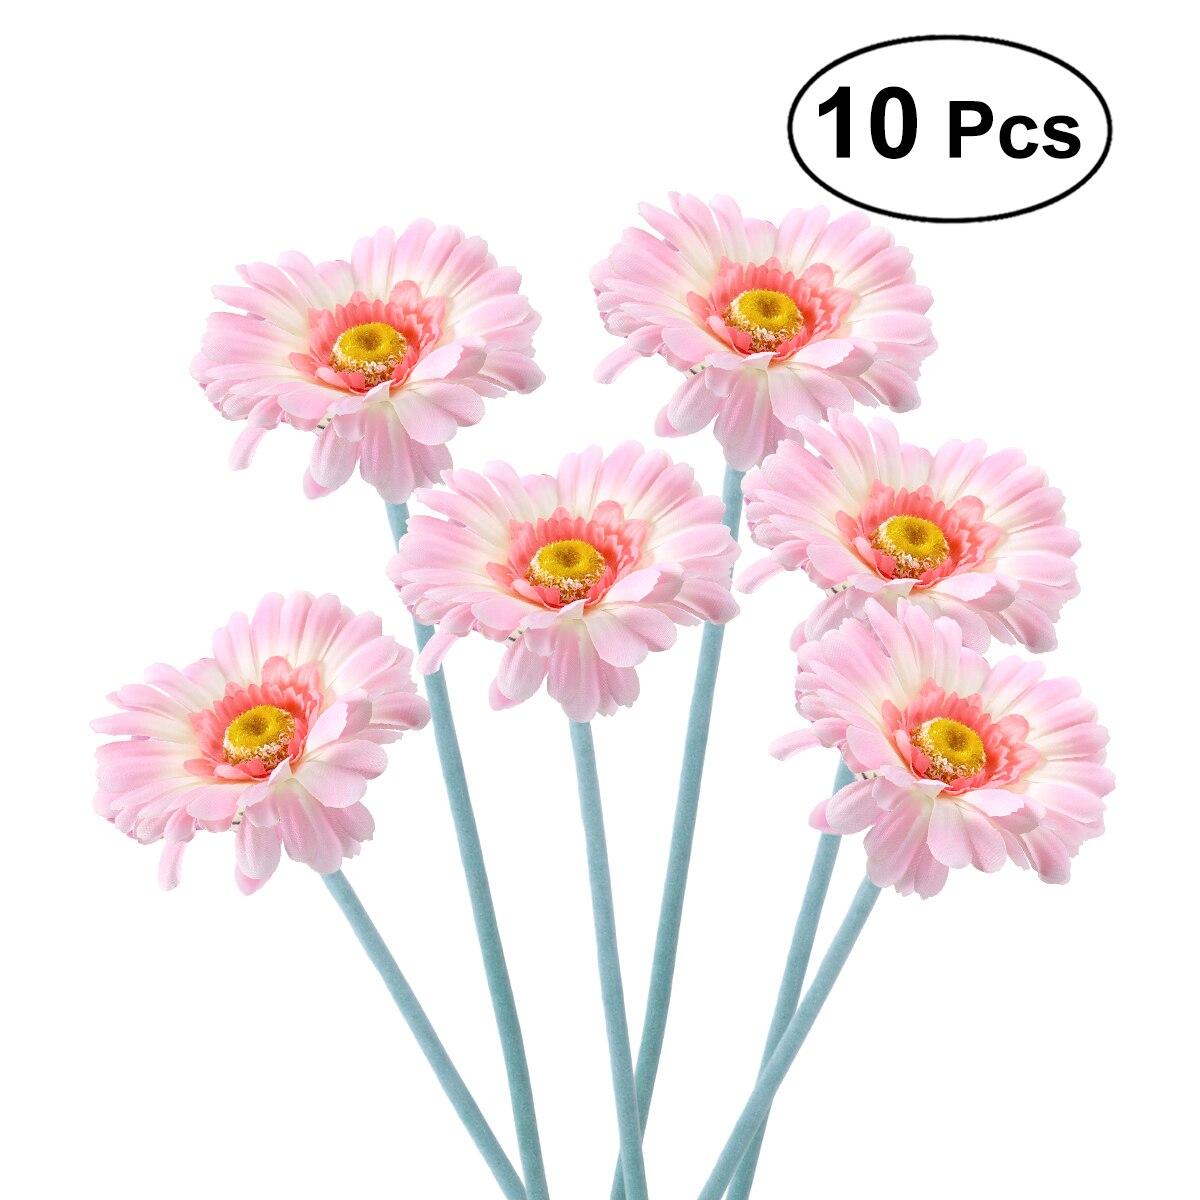 10pcs Artificial Sunflower Plastic Fake Gerbera Bunch For Home ...